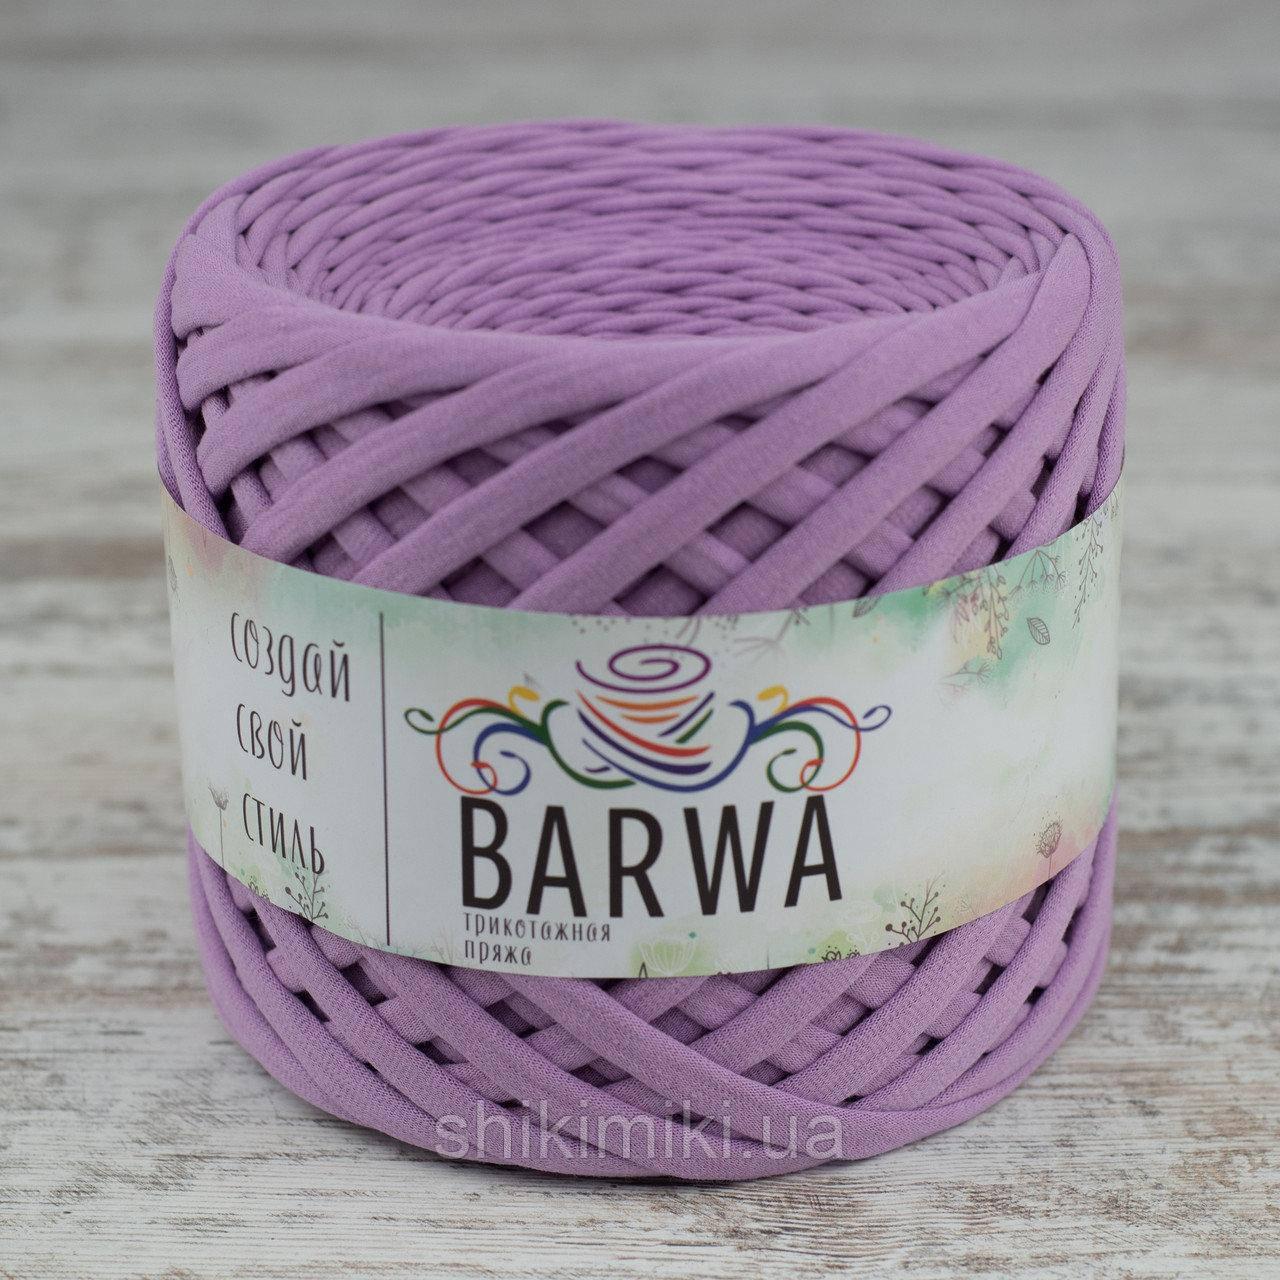 Трикотажная пряжа Barwa (7-9 мм), цвет Нежная сирень